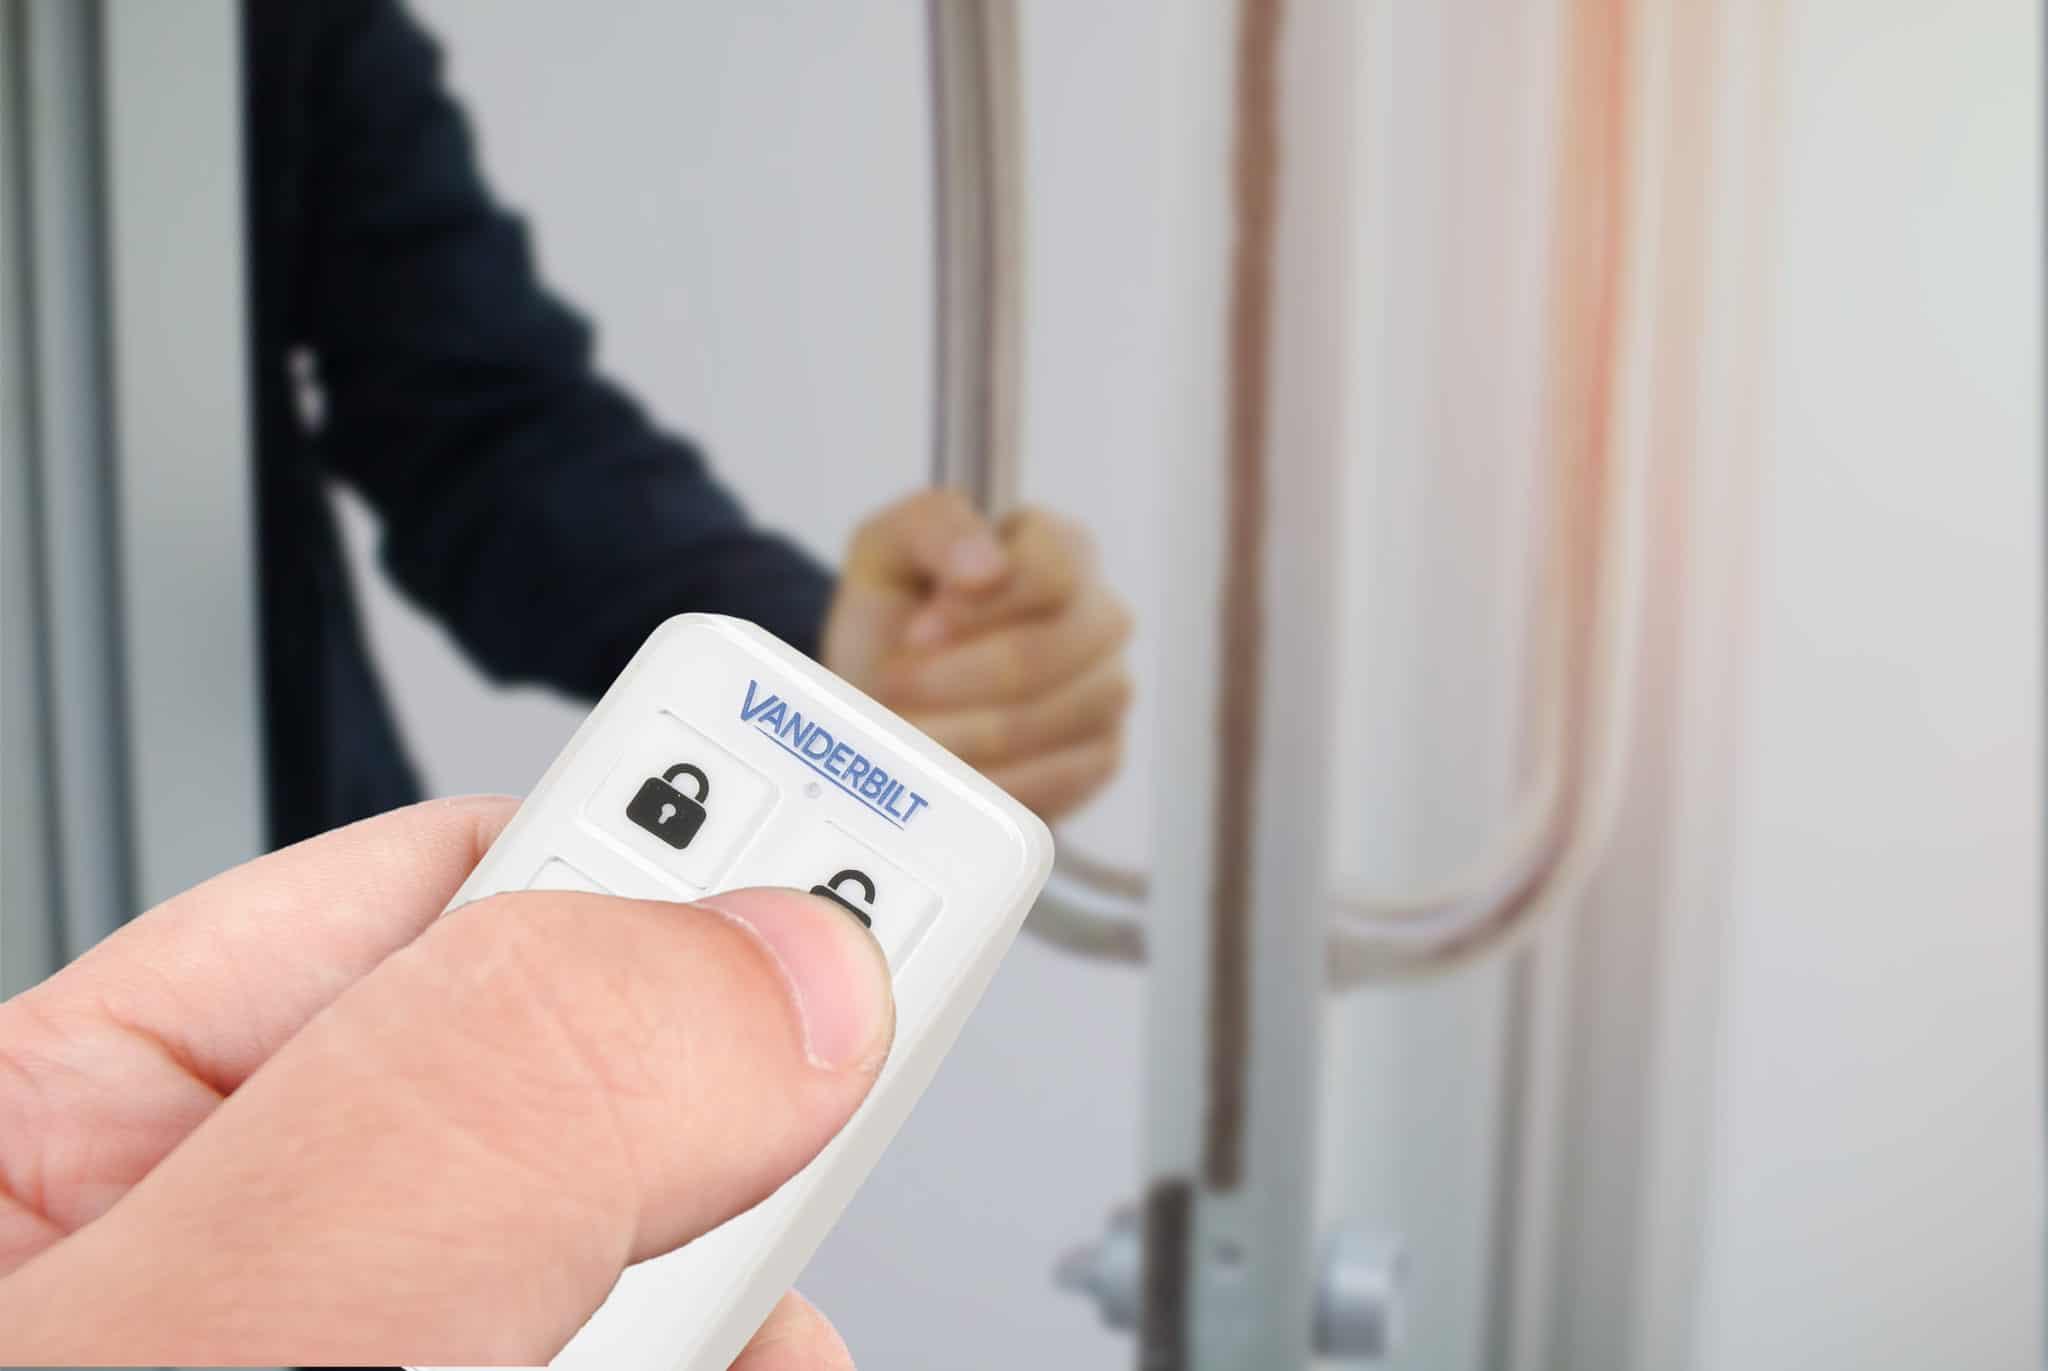 Vanderbilt SPC launch new wireless portfiolo